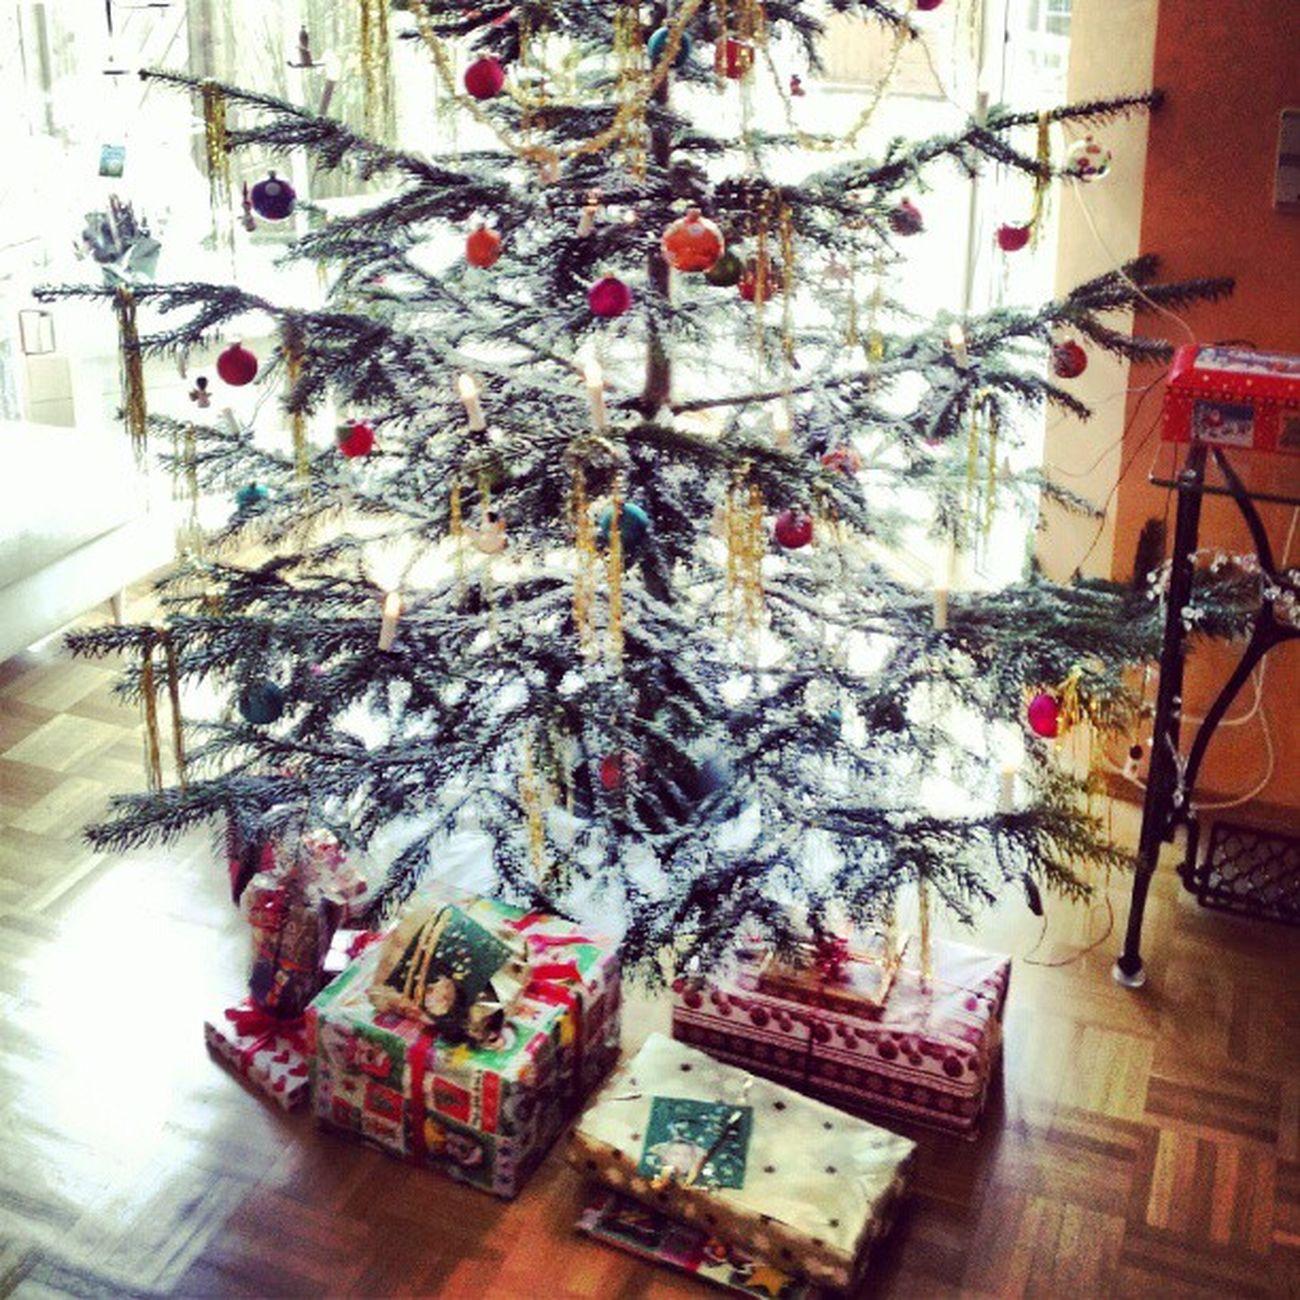 #chrismas #tree #gifts #deco #igers #igfamos #instgramm #instagood Tree Déco Chrismas Gifts Igers Instagood Igfamos Instgramm